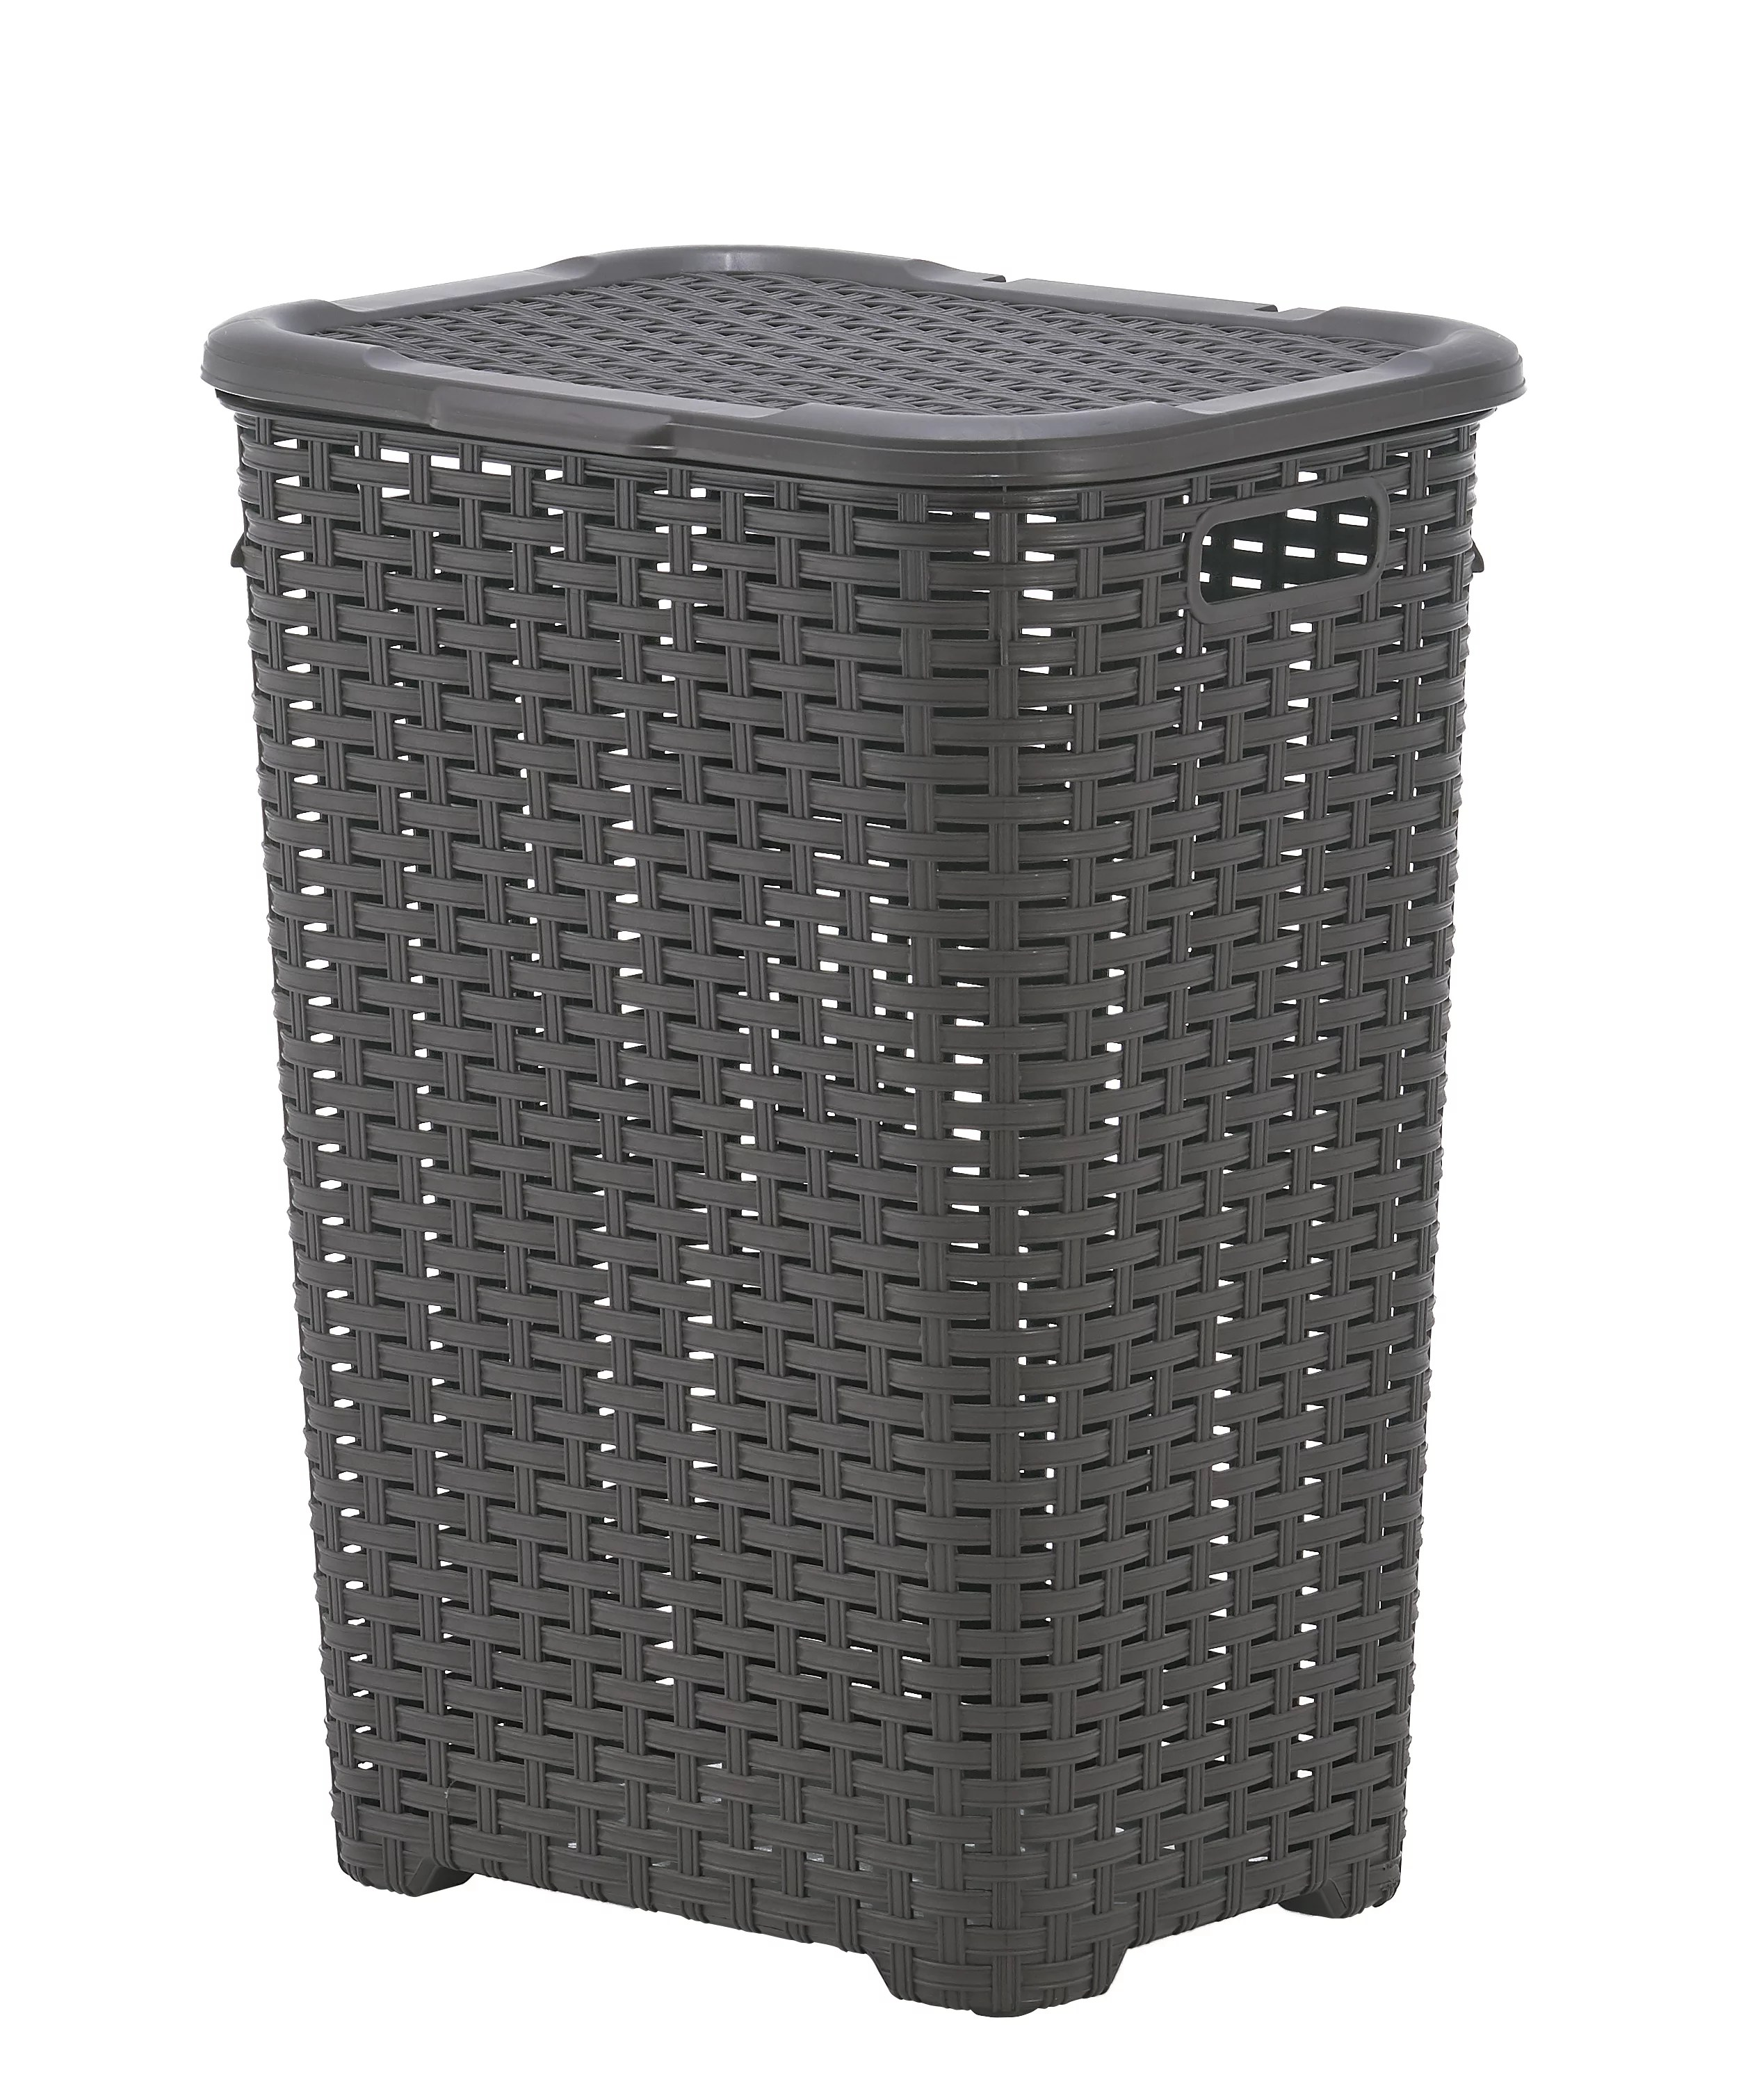 Laundry Basket Picture : laundry, basket, picture, Laundry, Basket,, Hamper, Large, 60-liter, Wicker, Style, Cutout, Handle,, Storage, Dirty, Clothes, Washroom,, Bathroom,, Bedroom,, Room,, Brown, Color., Superio, Walmart.com